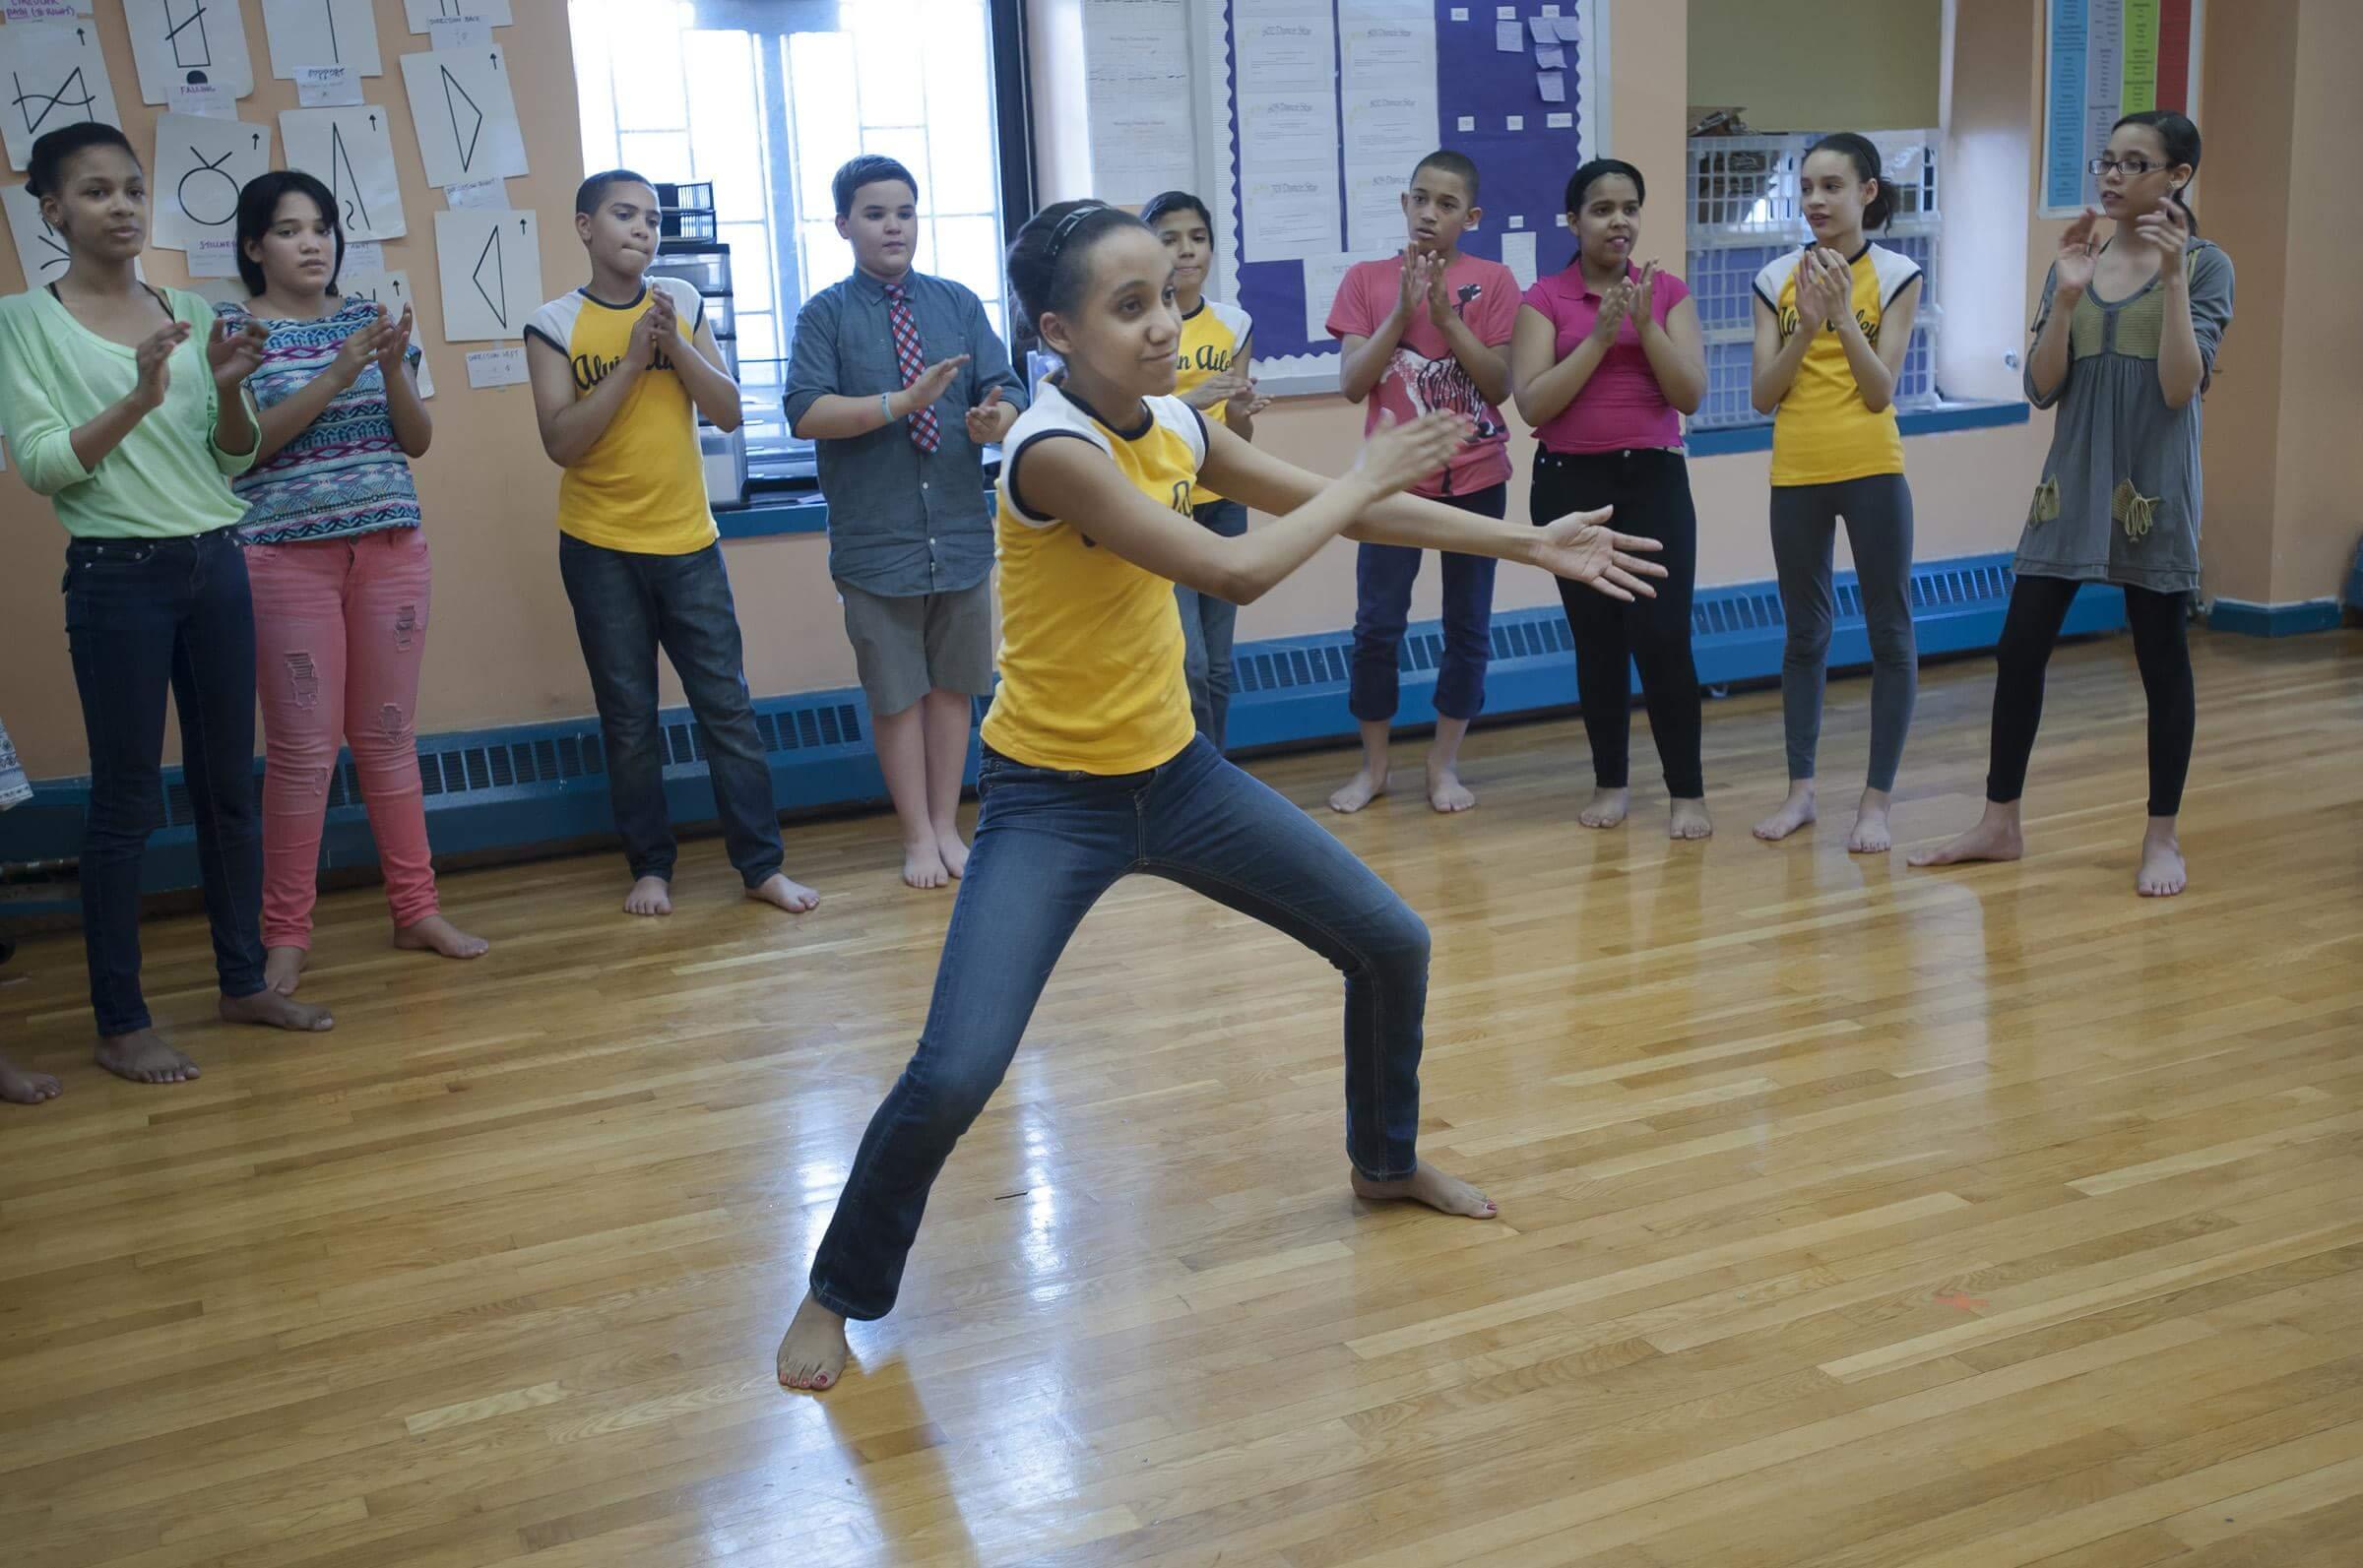 Arts In Education & Community Programs Alvin Ailey